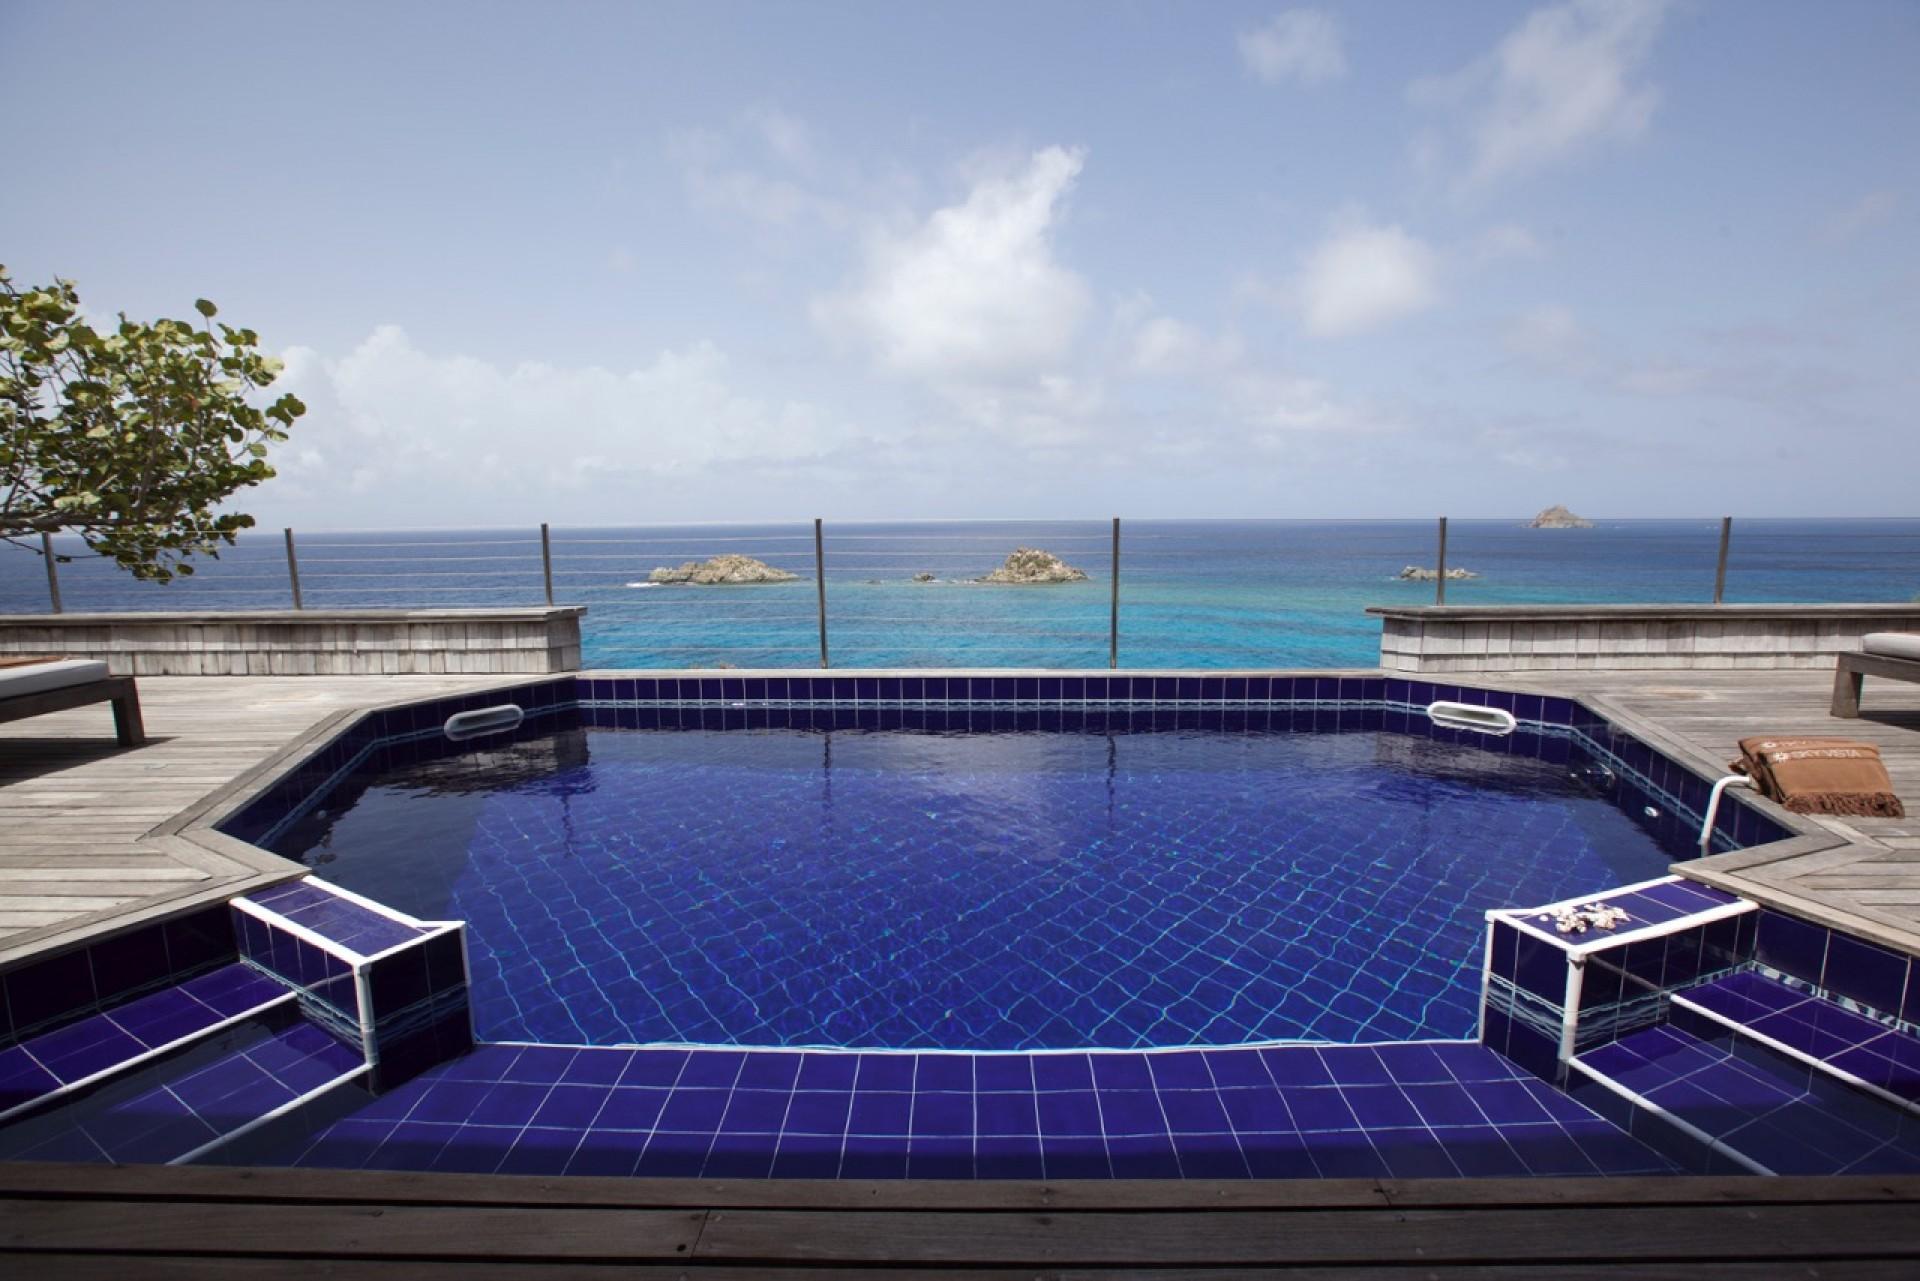 sky vista (jpc) - villa sky vista (jpc) st. barts | st barts blue